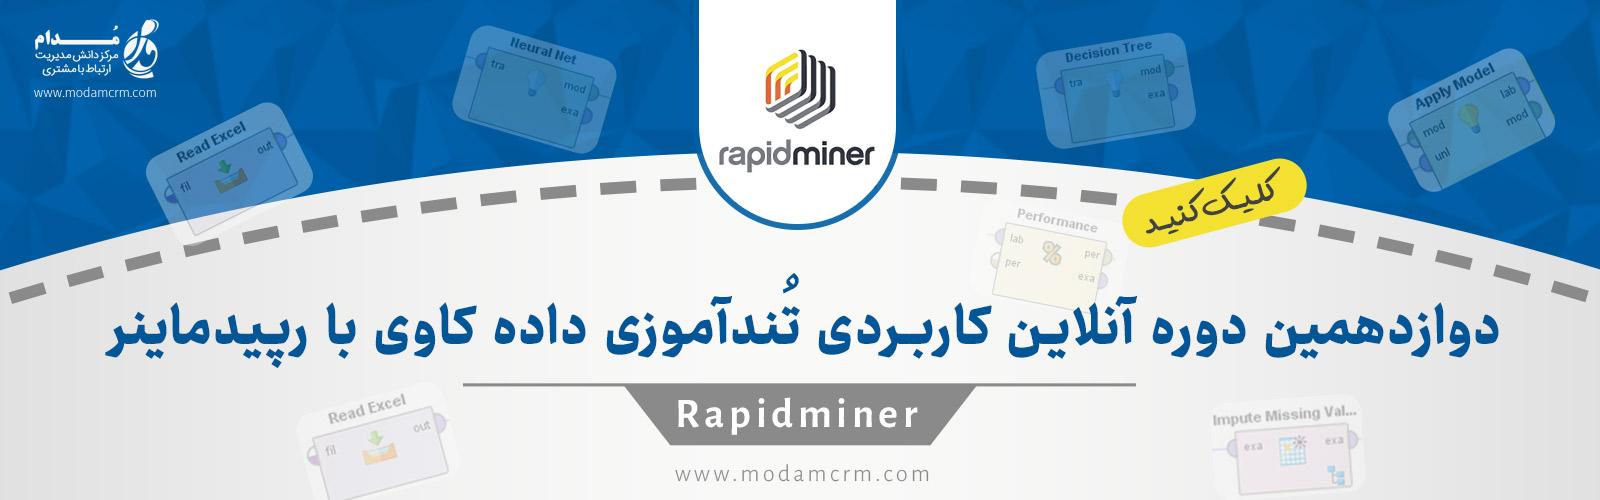 Rapidminer Course